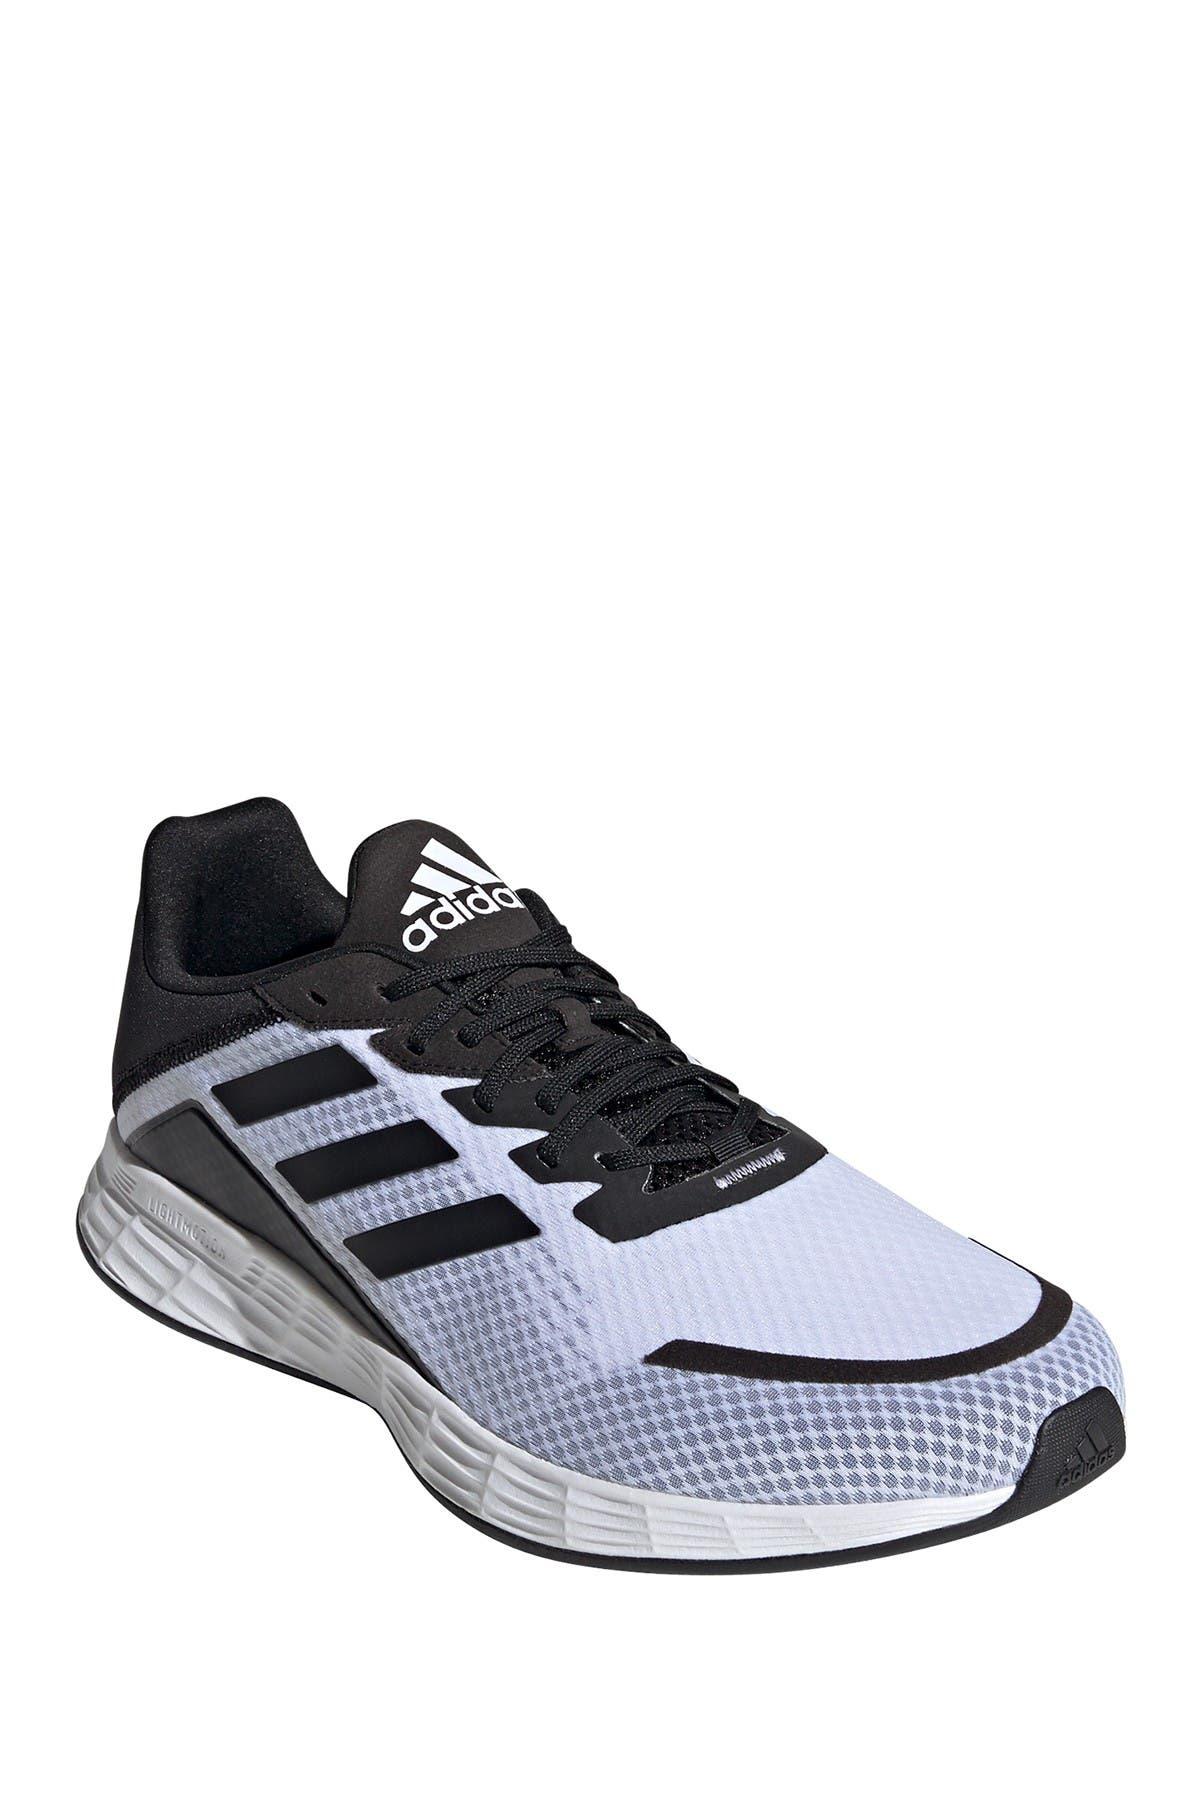 adidas | Duramo SL Running Sneaker